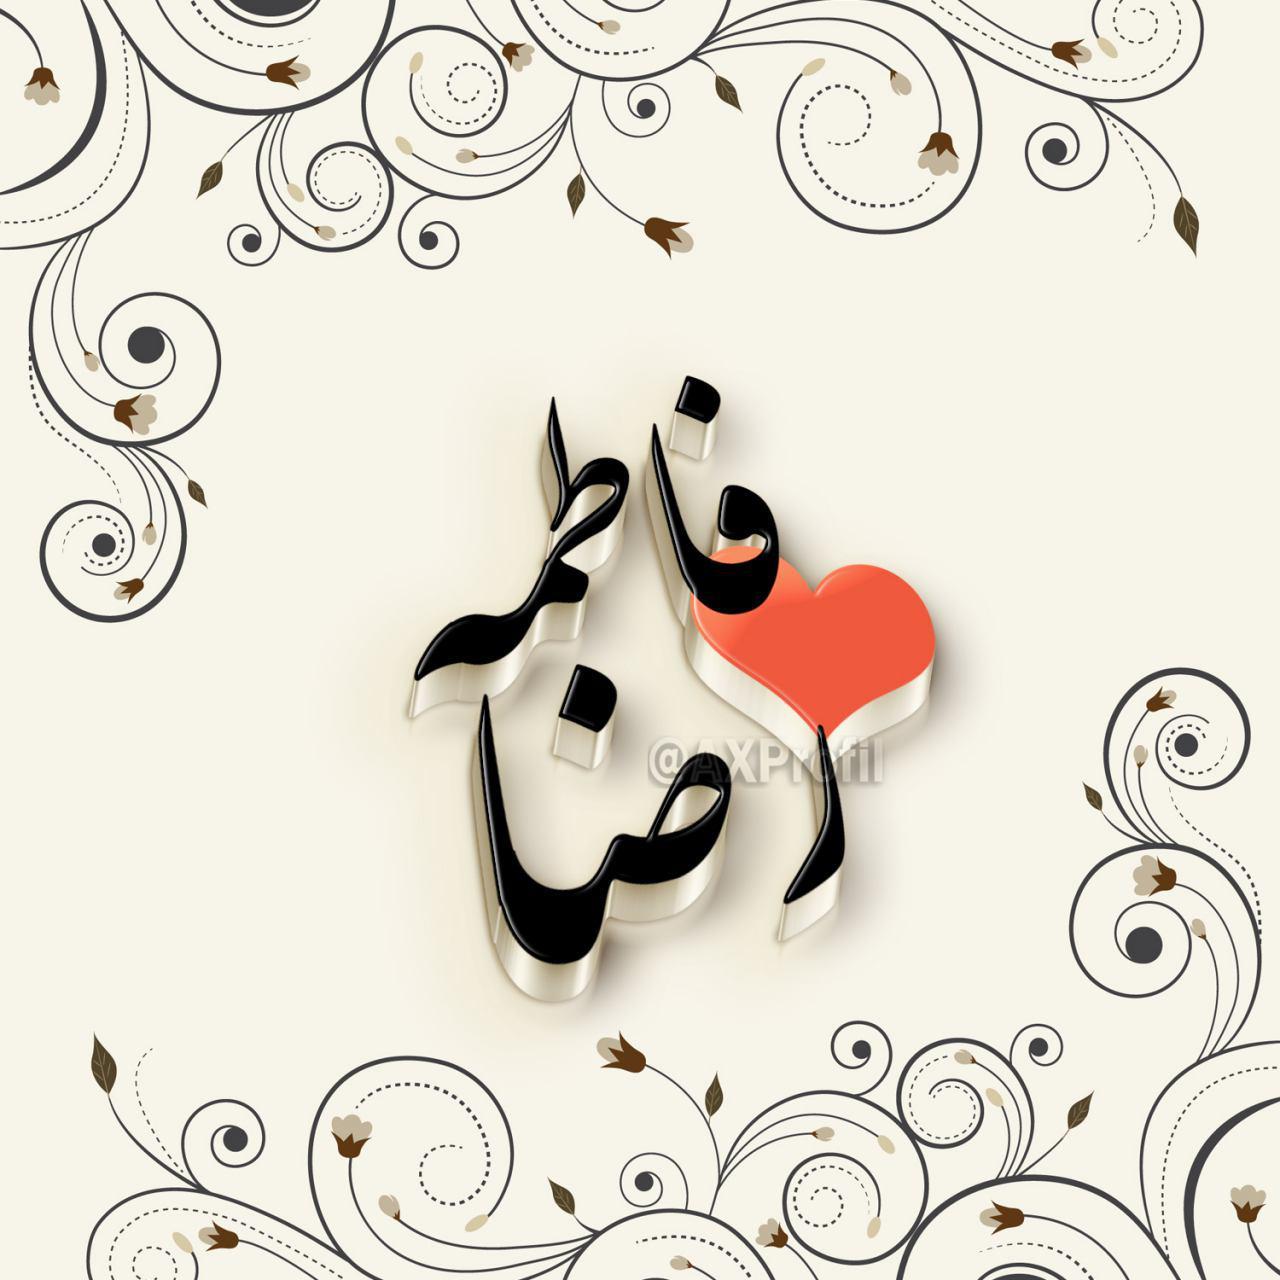 عکس پروفایل عاشقانه اسم رضا و فاطمه